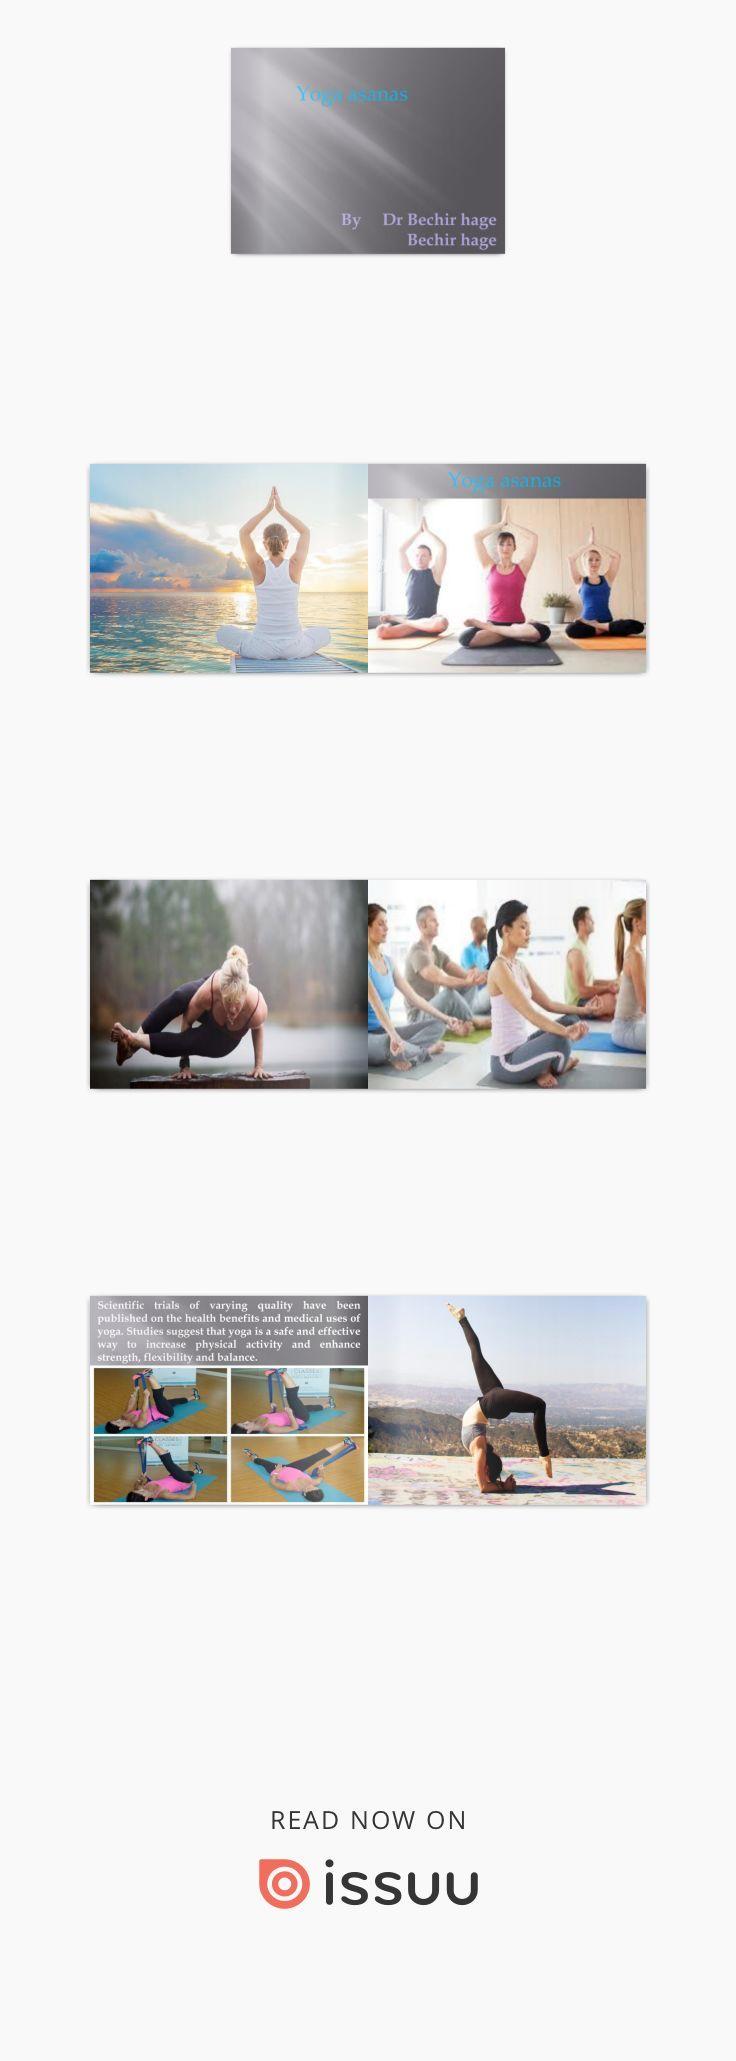 Yoga asanas by Dr Bechir hage and Bechir hage Physical